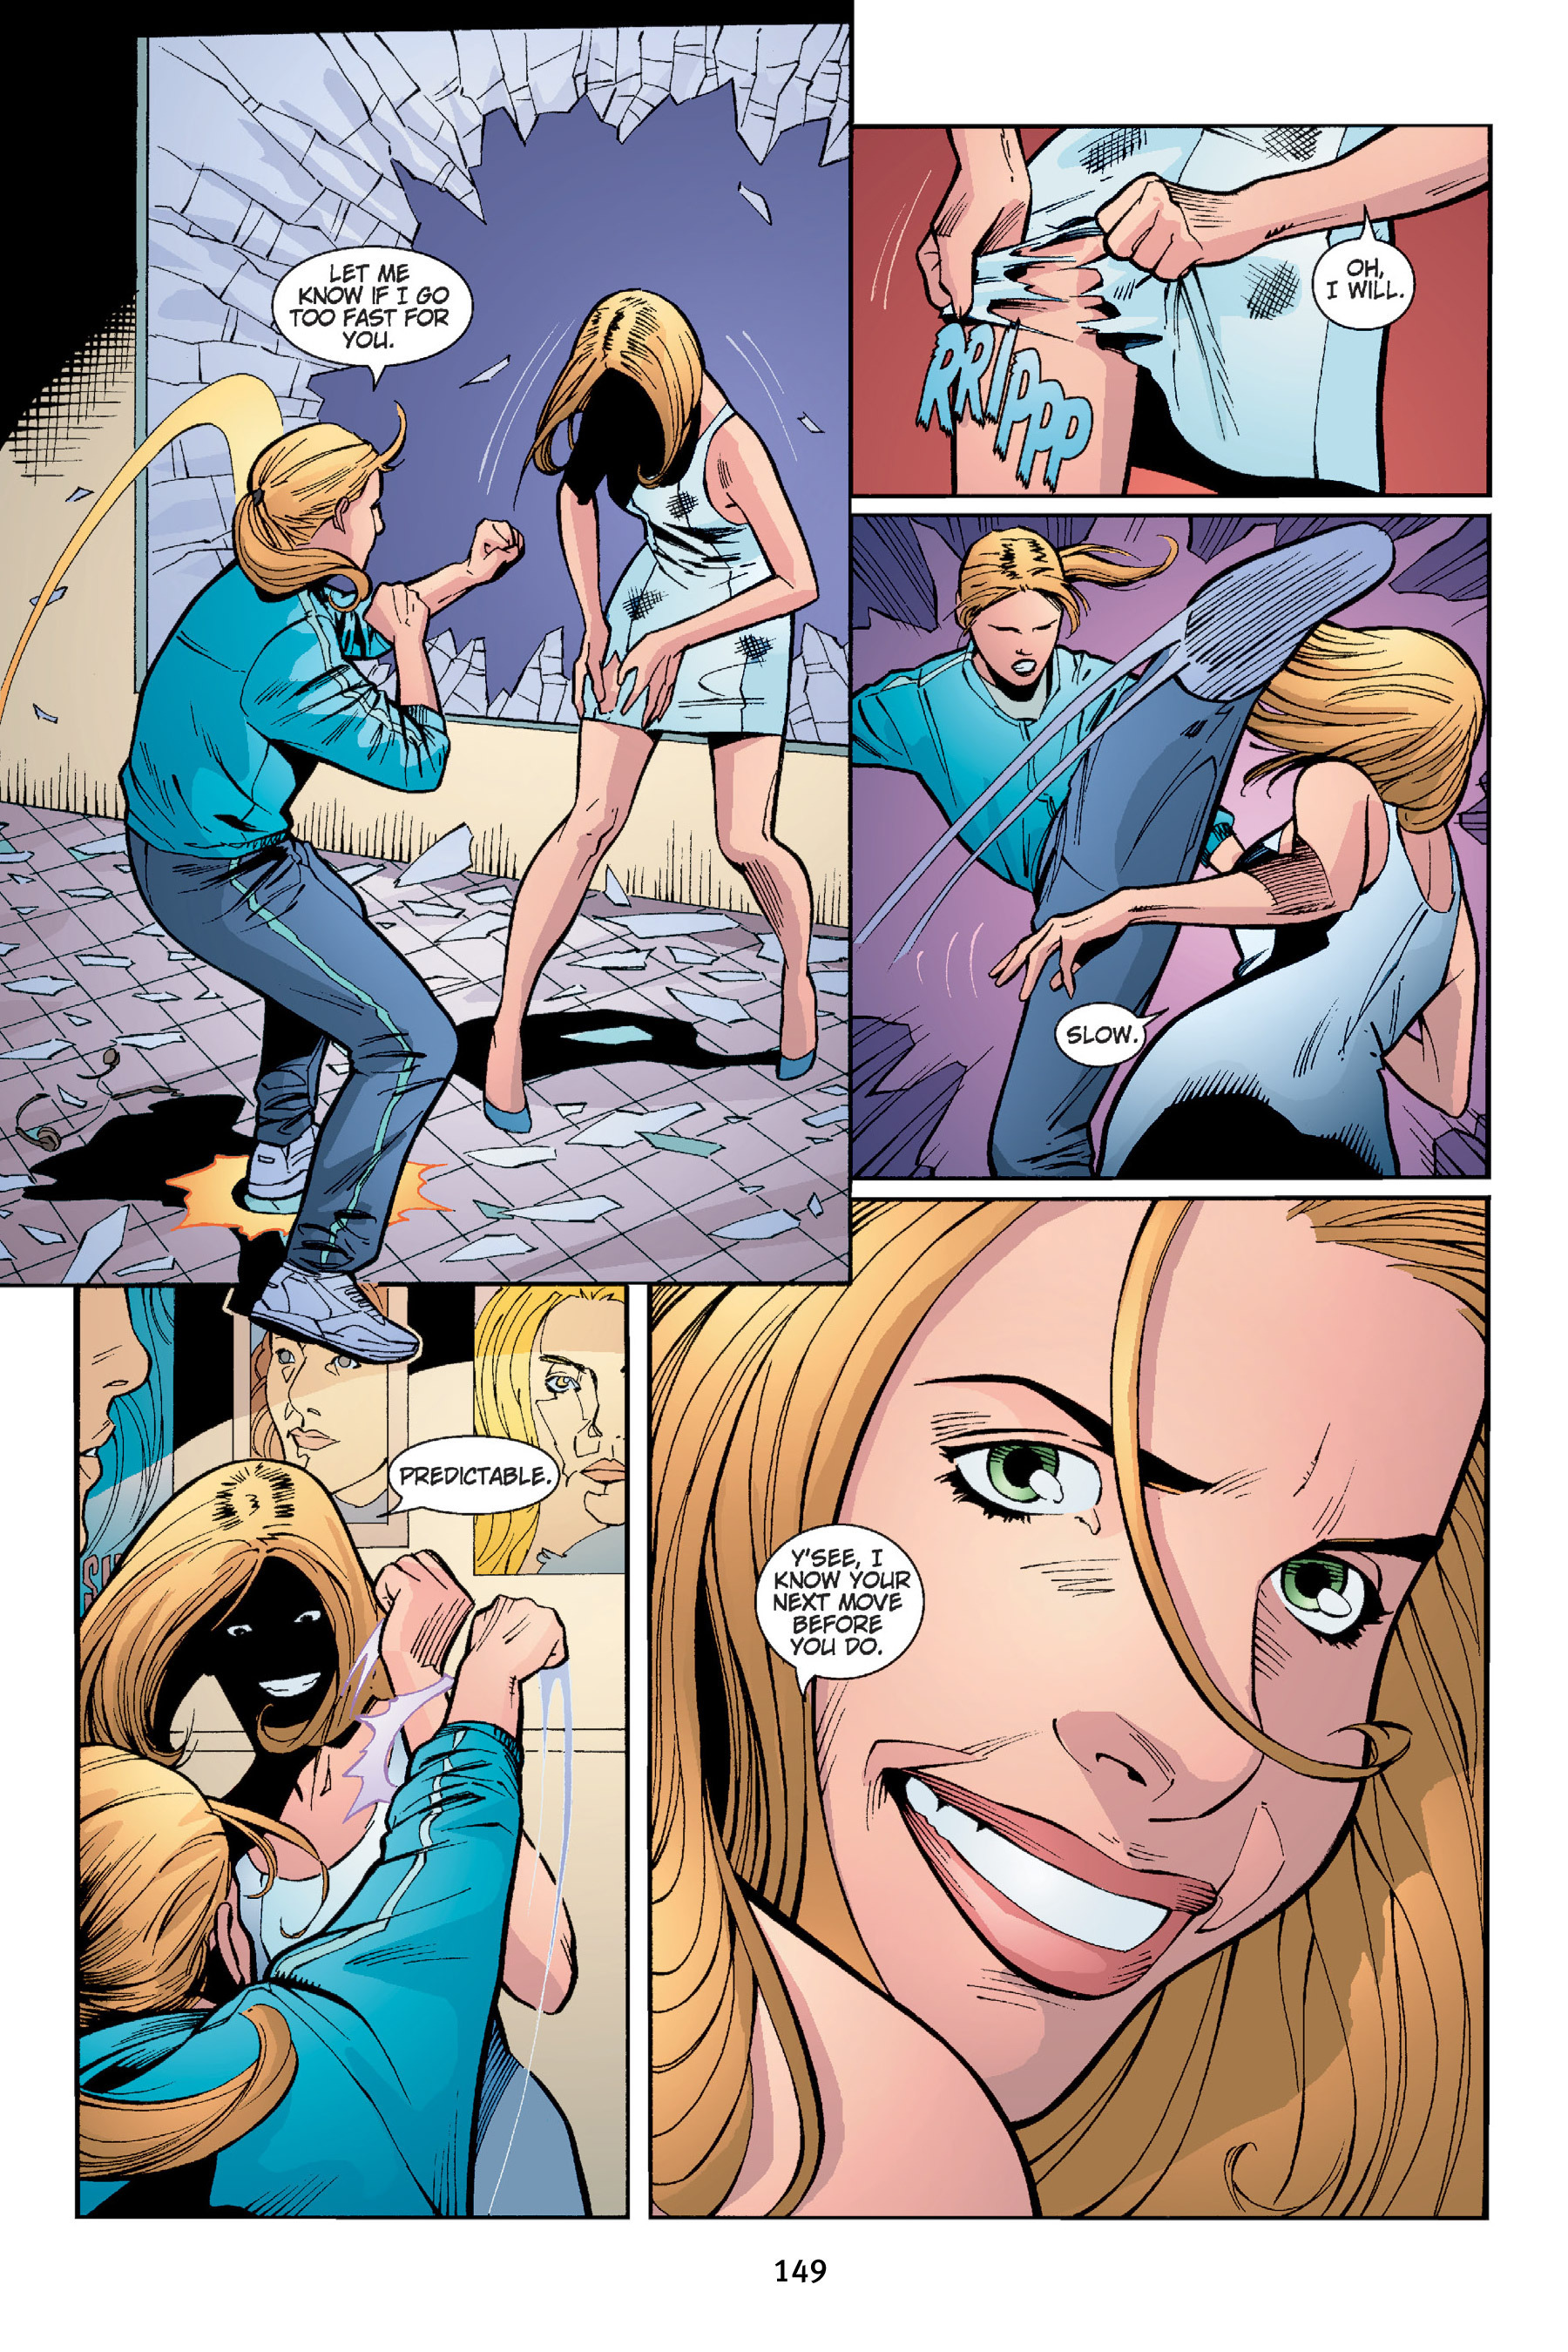 Read online Buffy the Vampire Slayer: Omnibus comic -  Issue # TPB 4 - 150